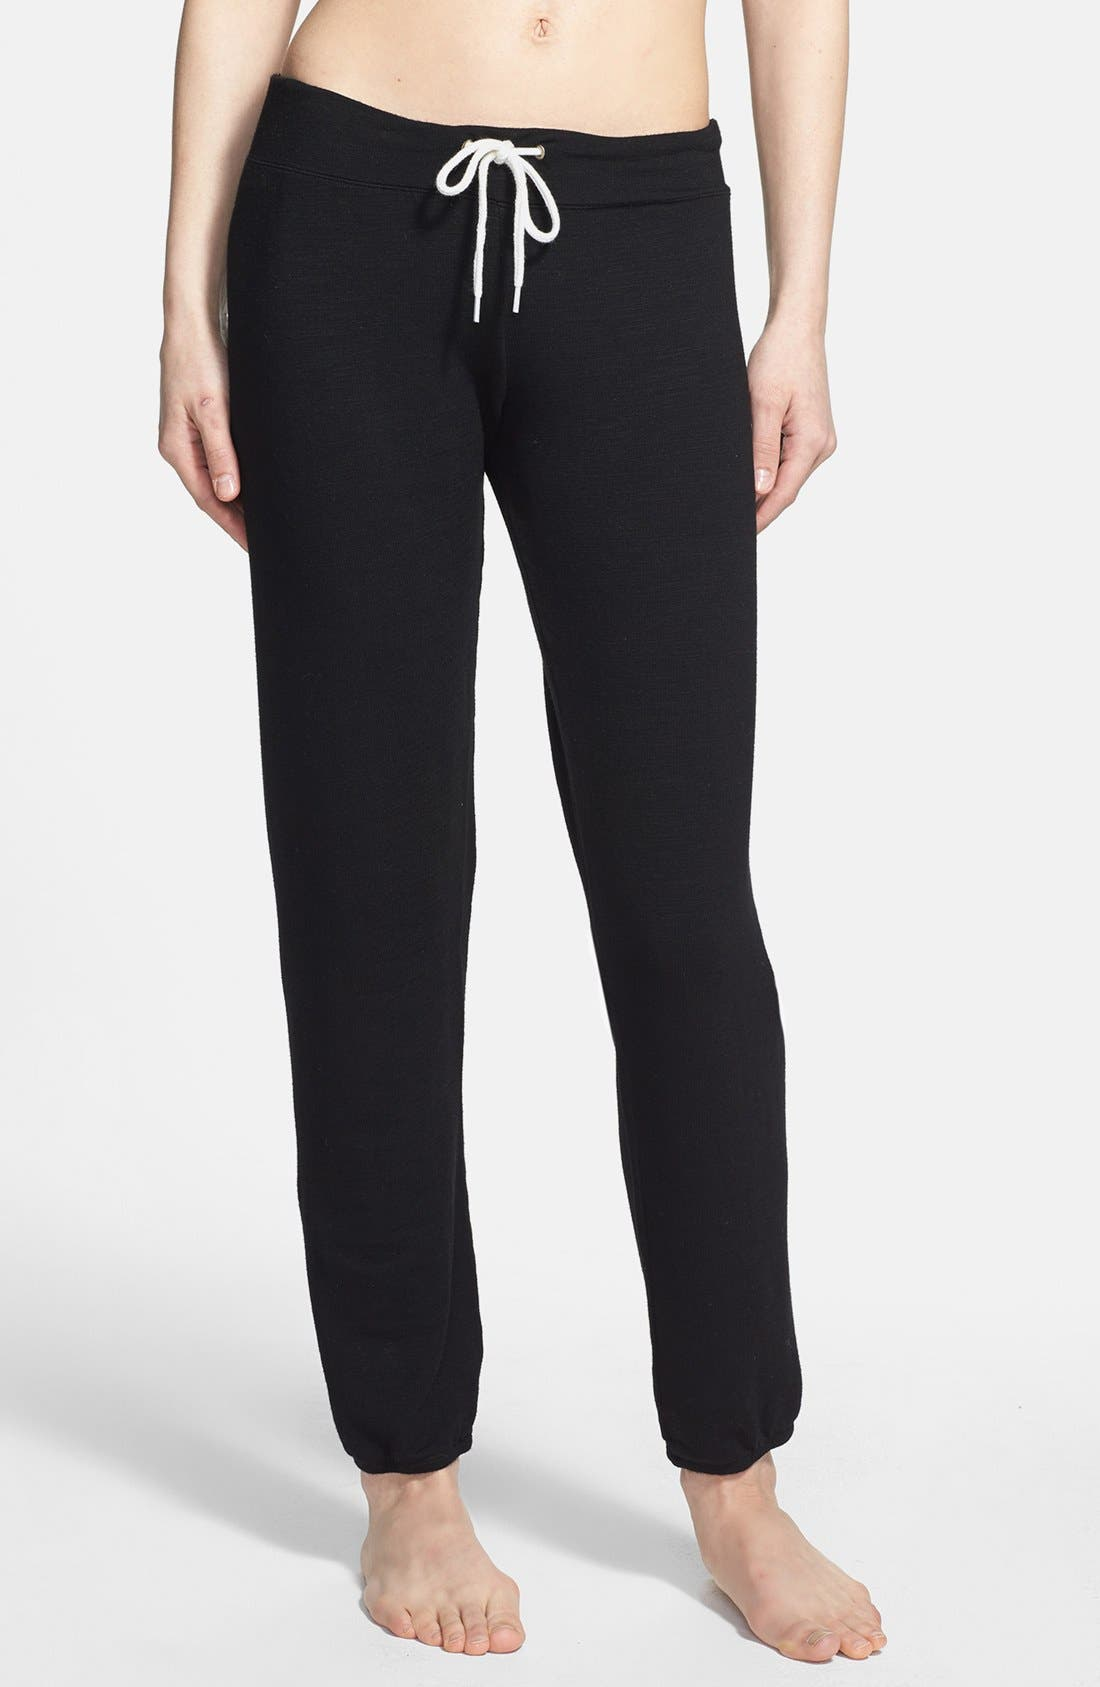 Alternate Image 1 Selected - Monrow 'Vintage' Sweatpants